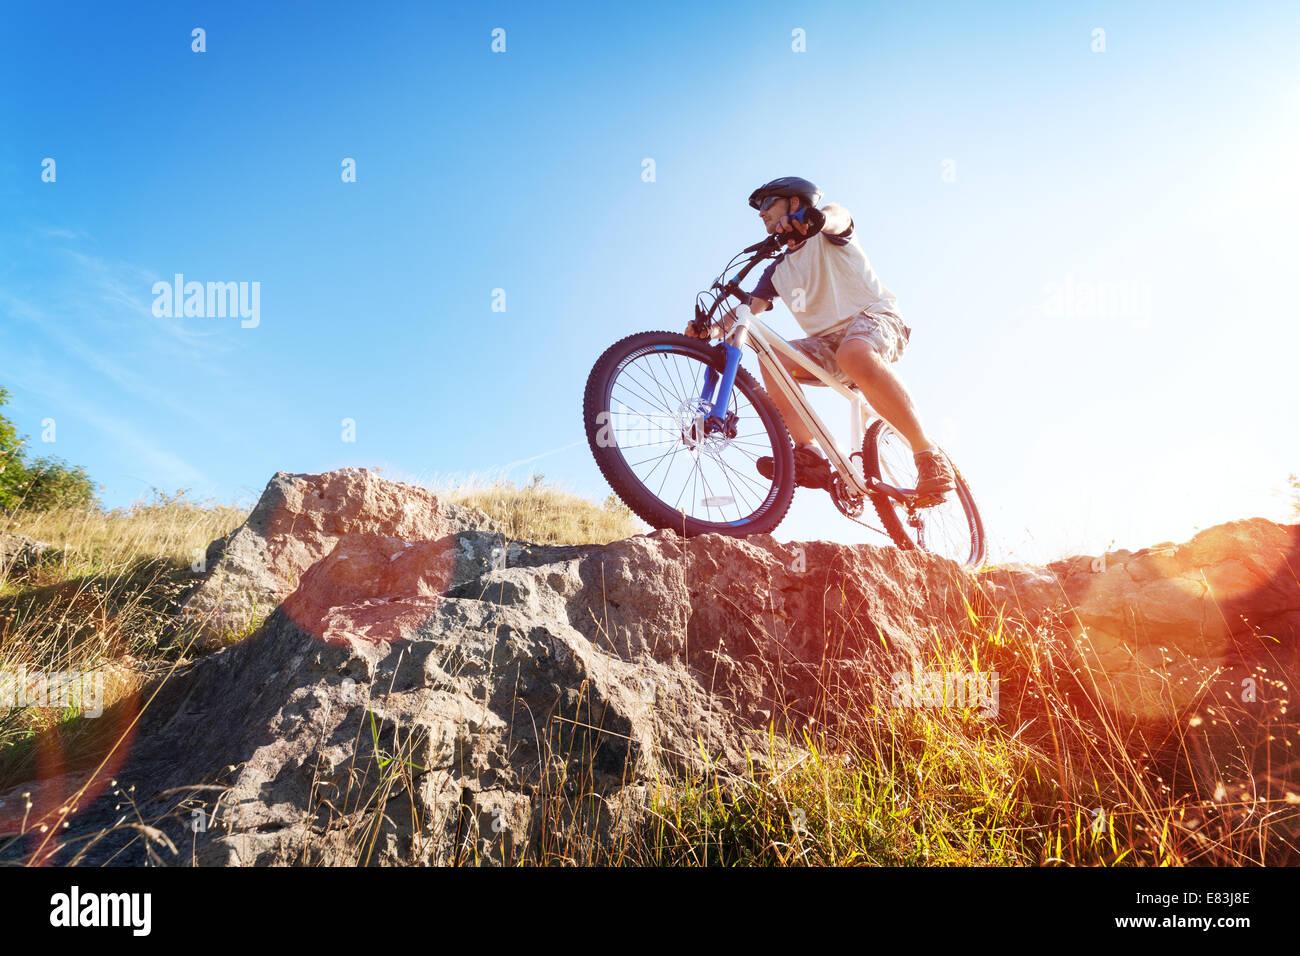 Mountain biker in action - Stock Image